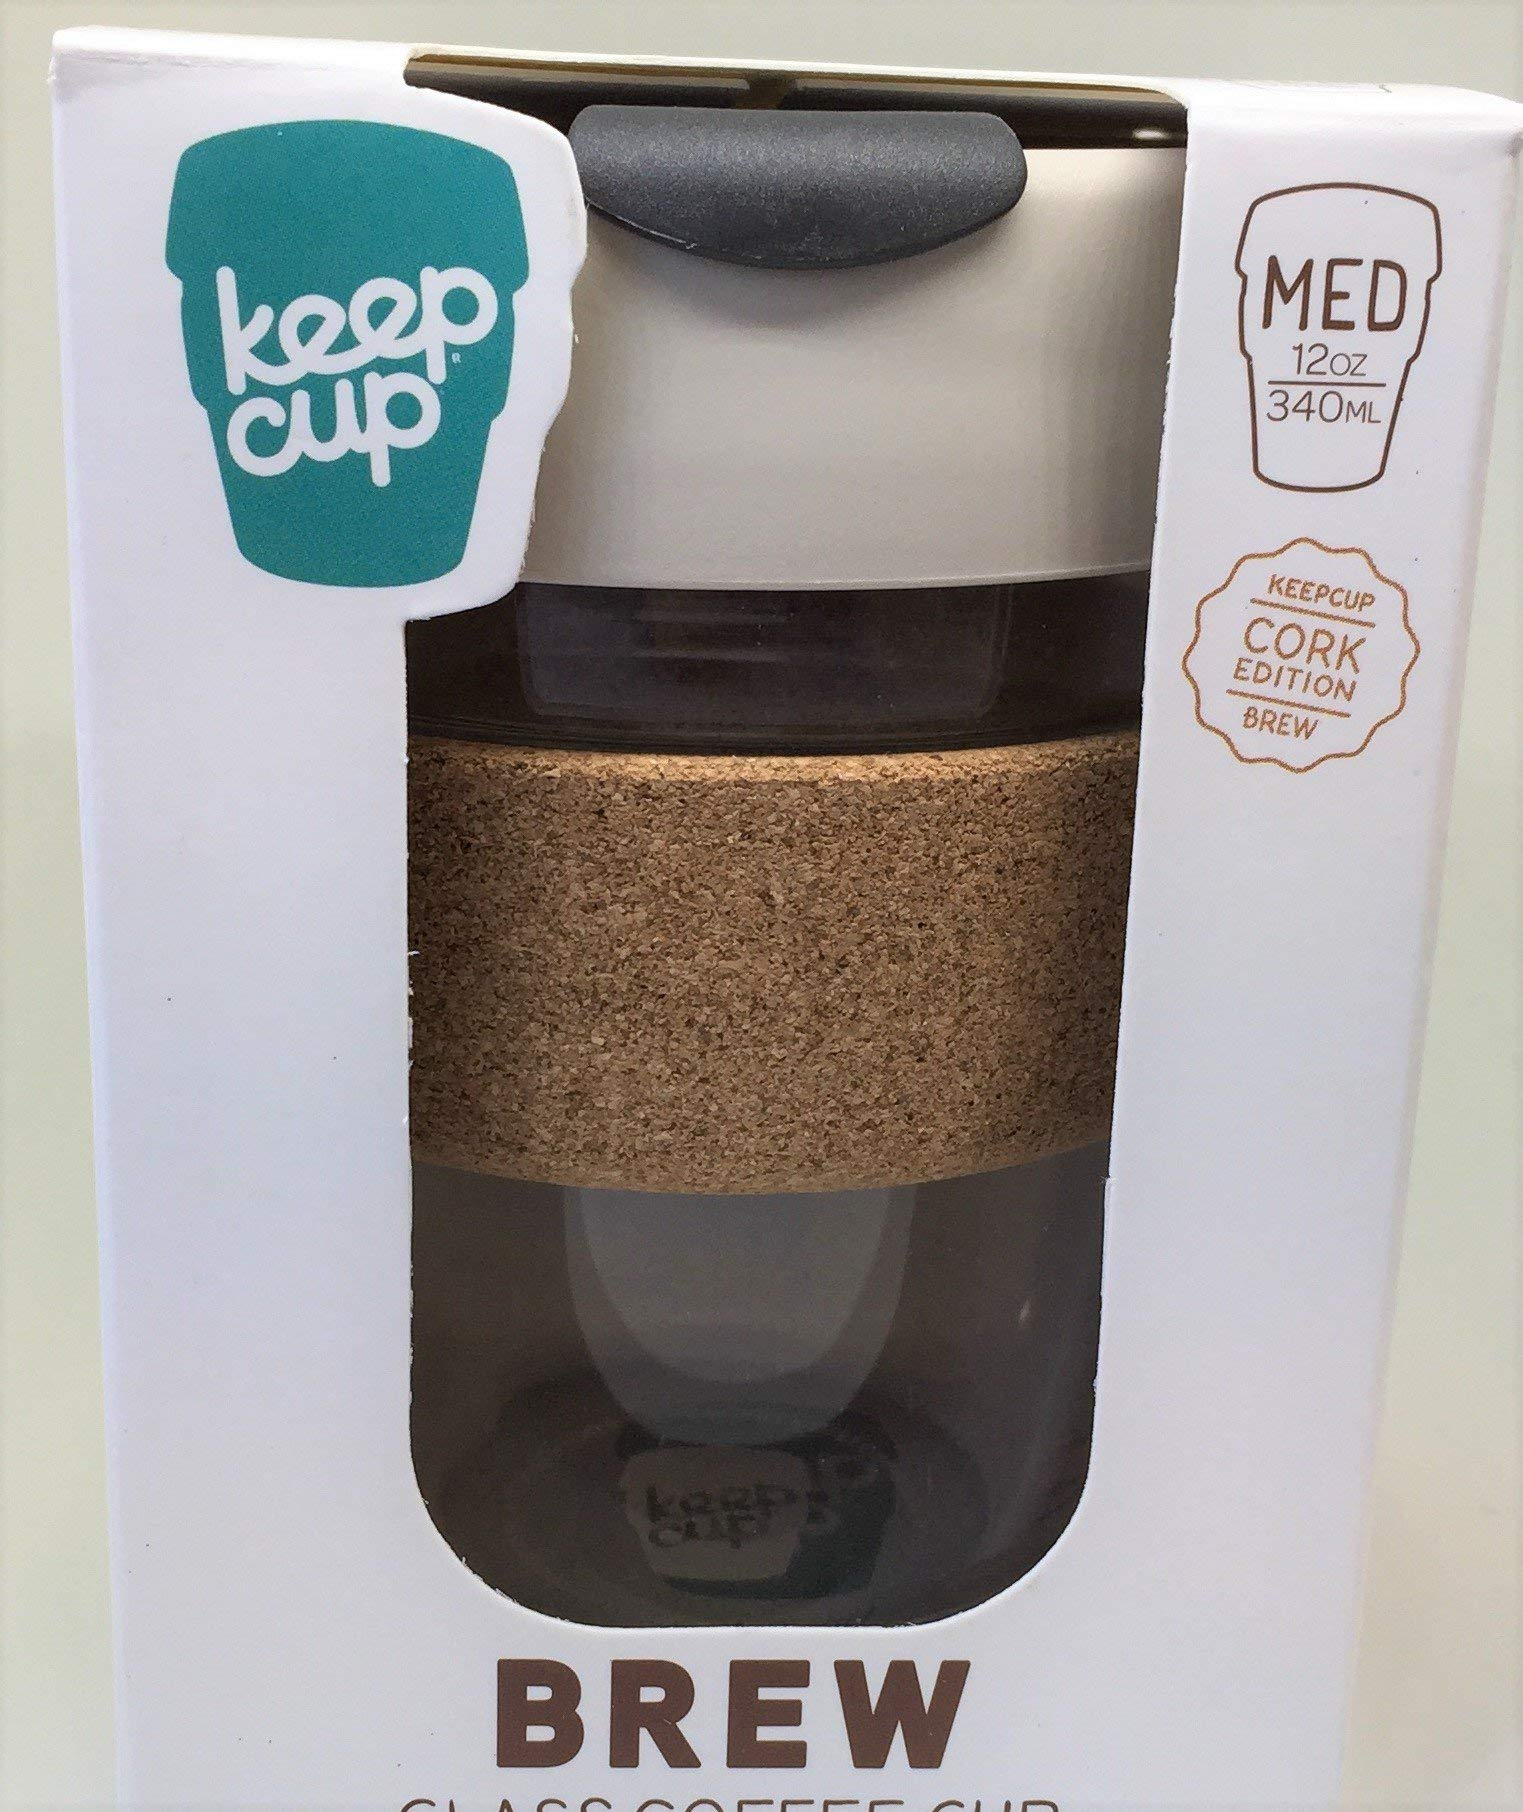 Keep-Cup-Brew